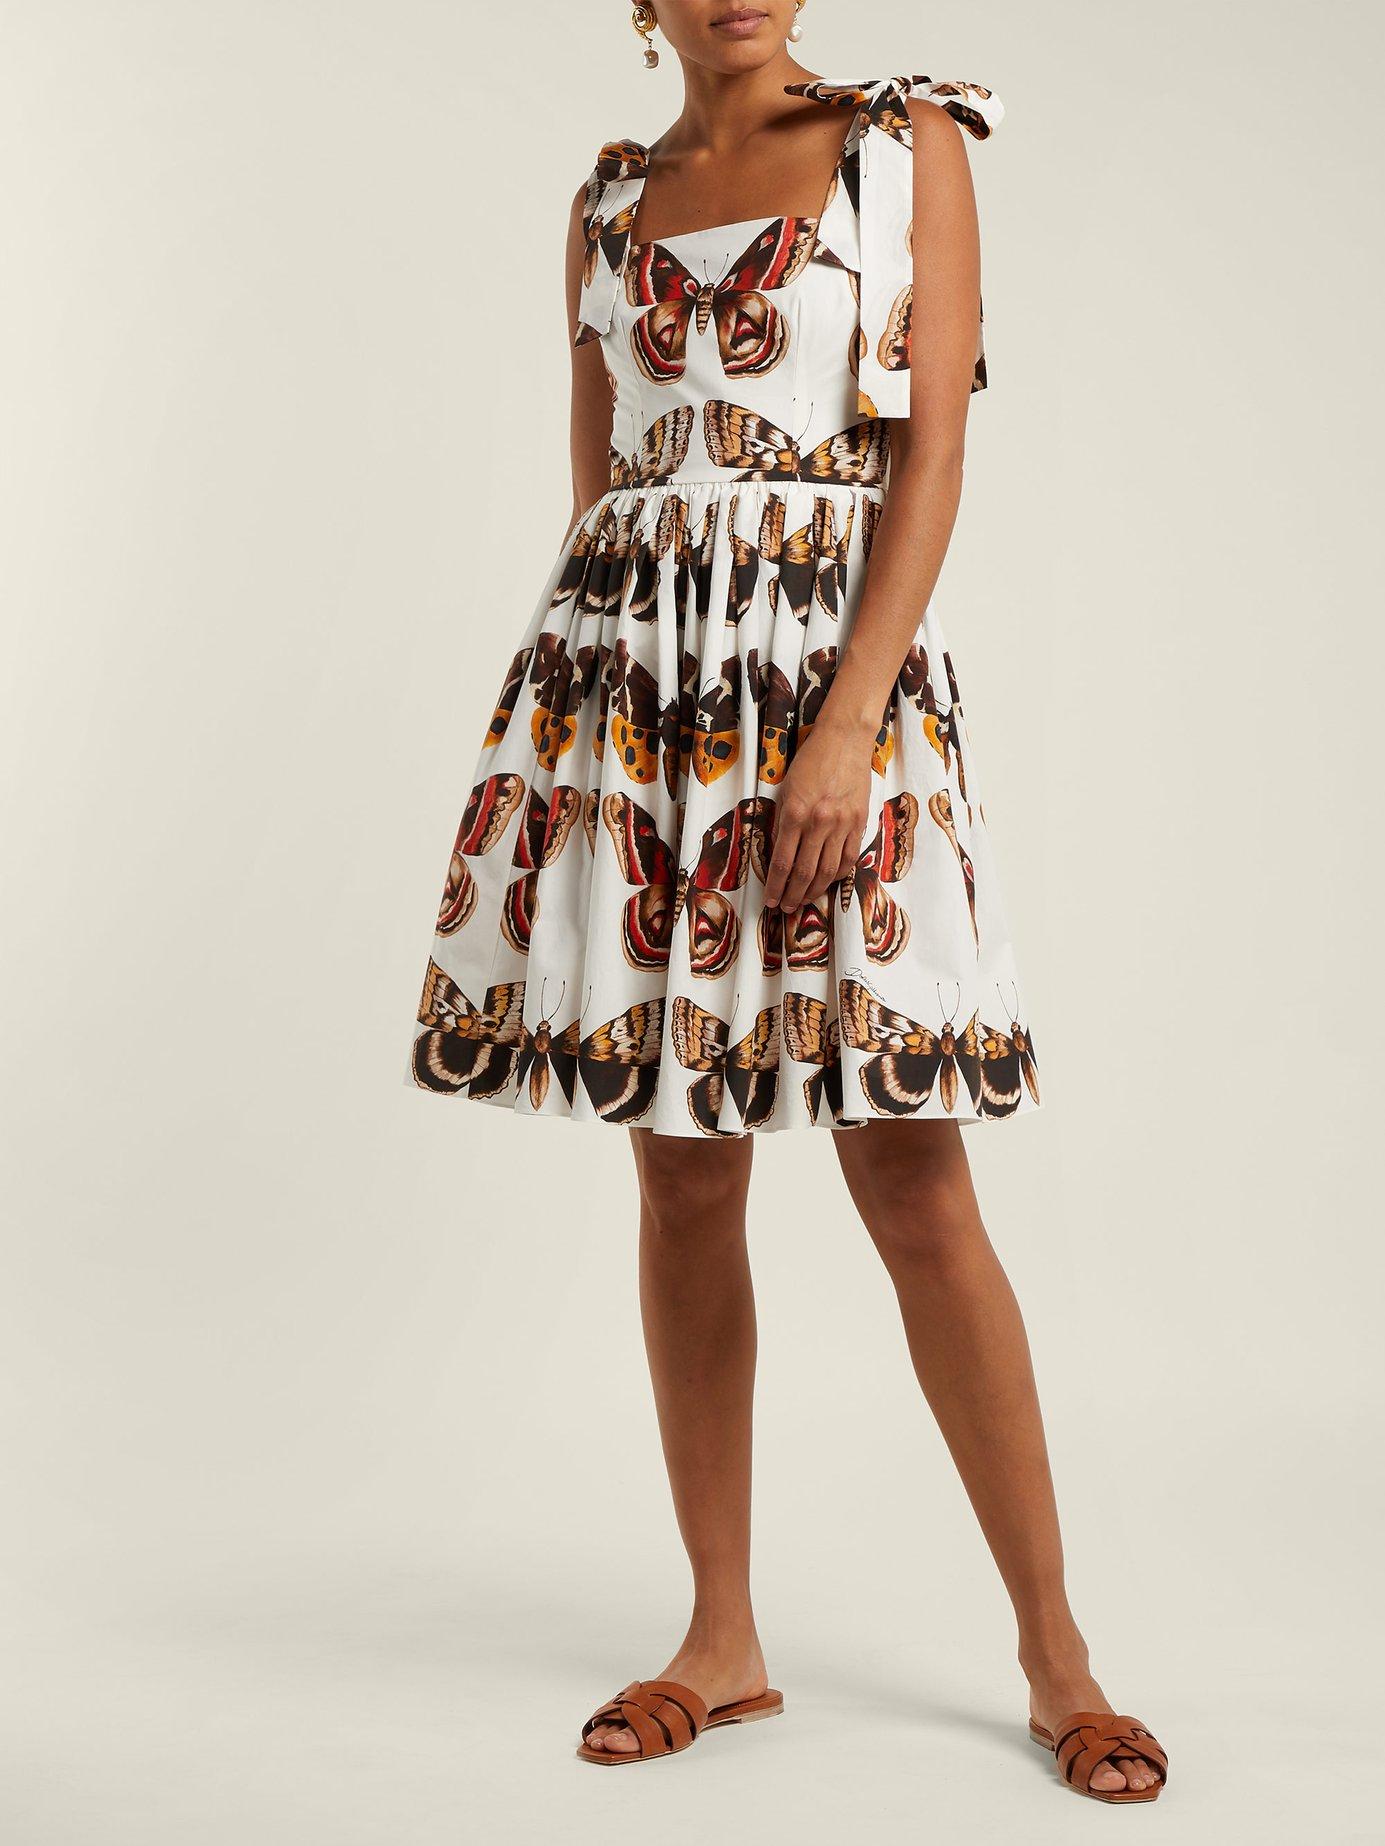 Butterfly-print cotton-poplin mini dress by Dolce & Gabbana